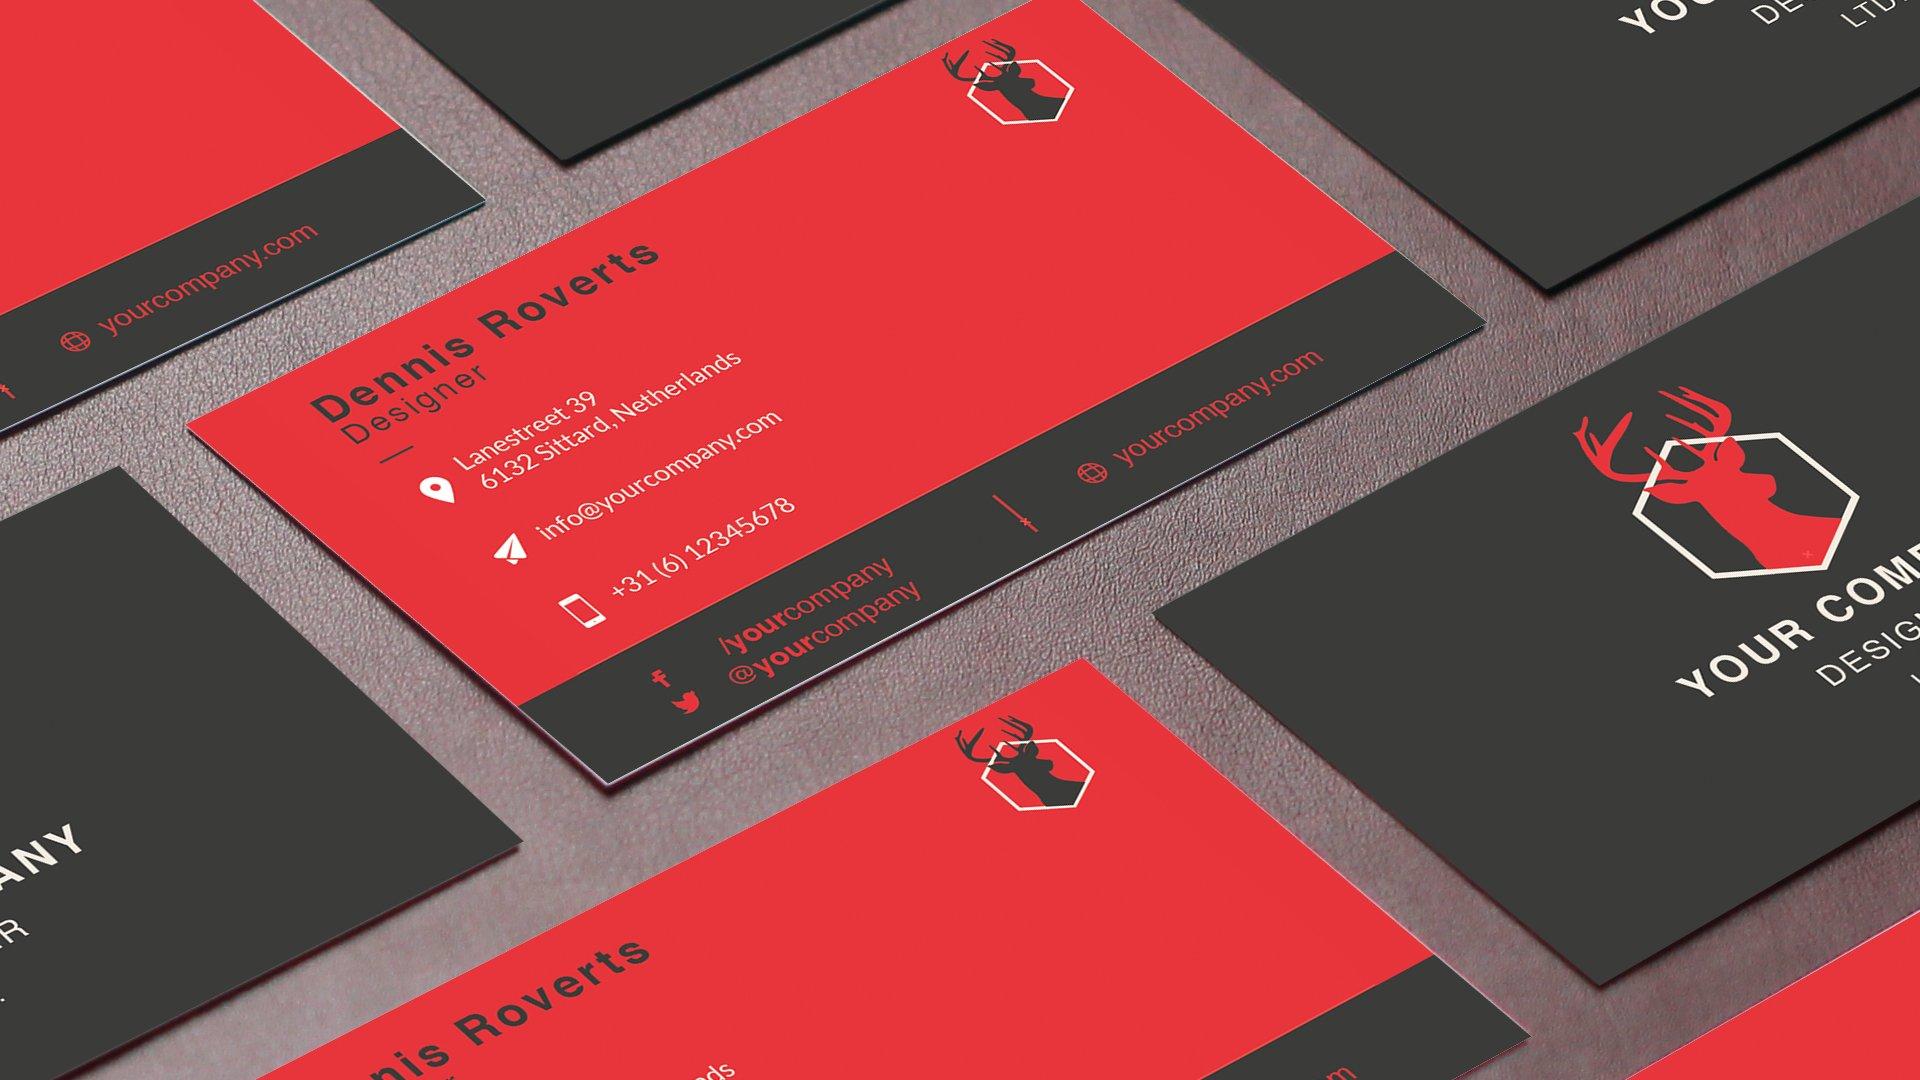 Eu clean business card template templates creative market eu clean business card template templates creative market reheart Gallery